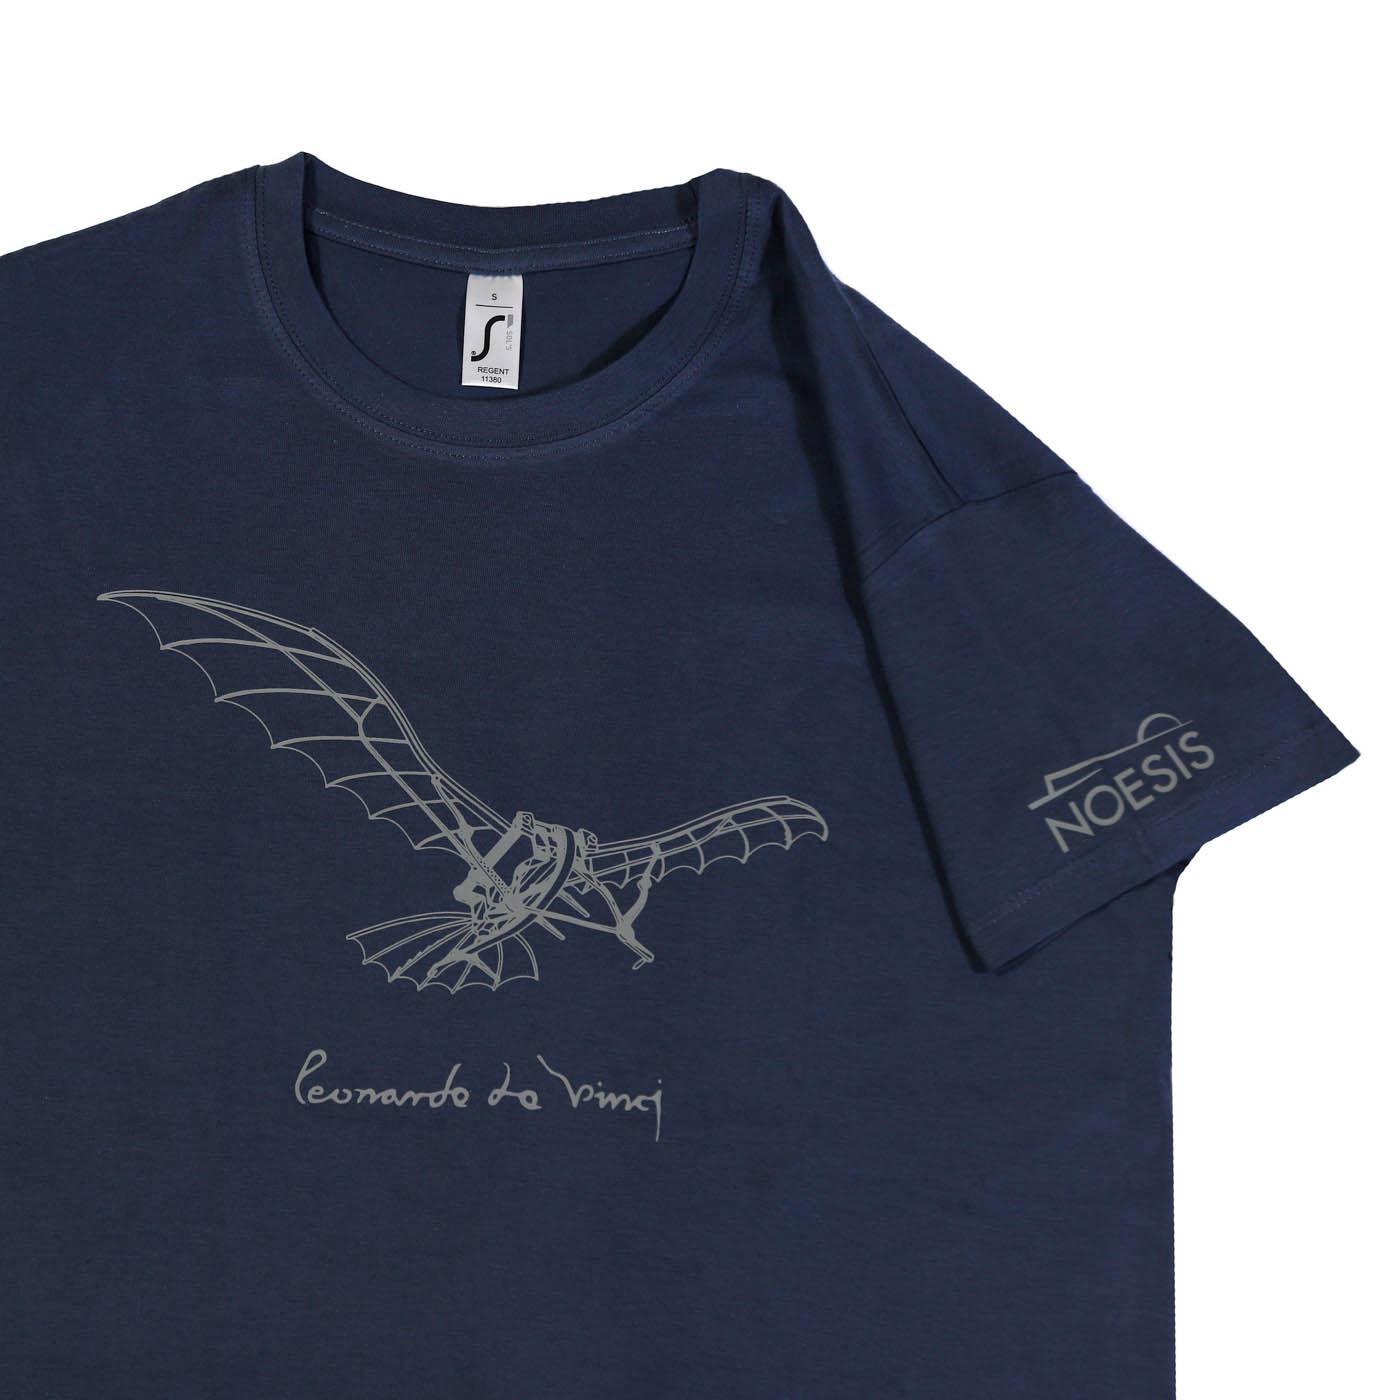 6107f7247c3d T-shirt Leonardo   Πτητική Μηχανή μπλε – Noesis Eshop